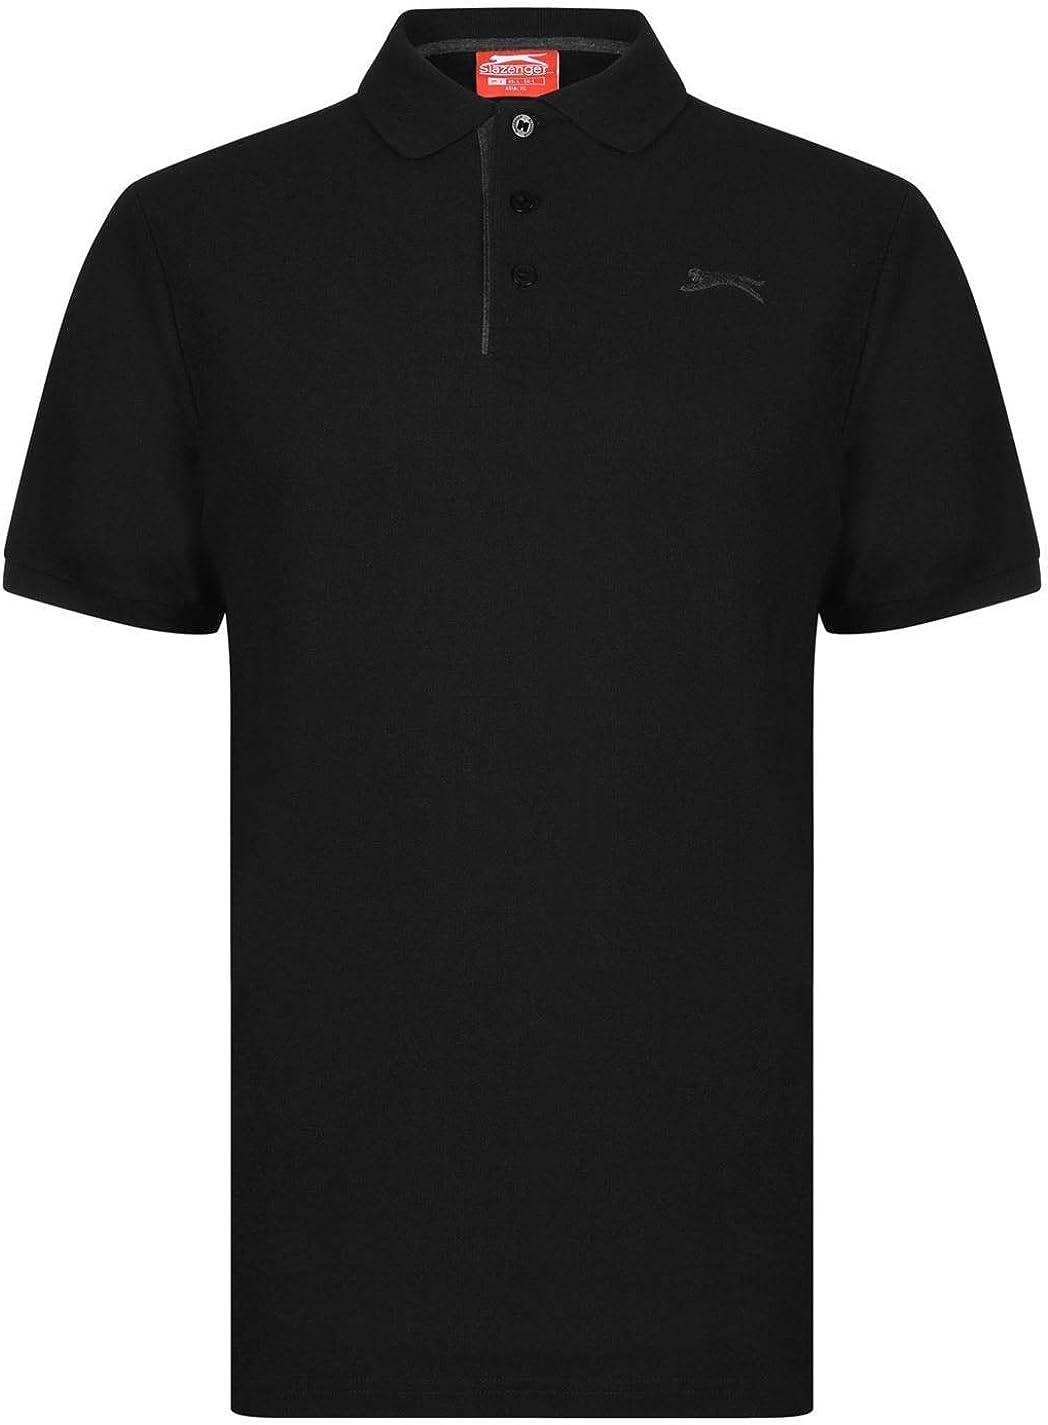 PF1738 Slazenger Mens Advantage Short Sleeve Polo